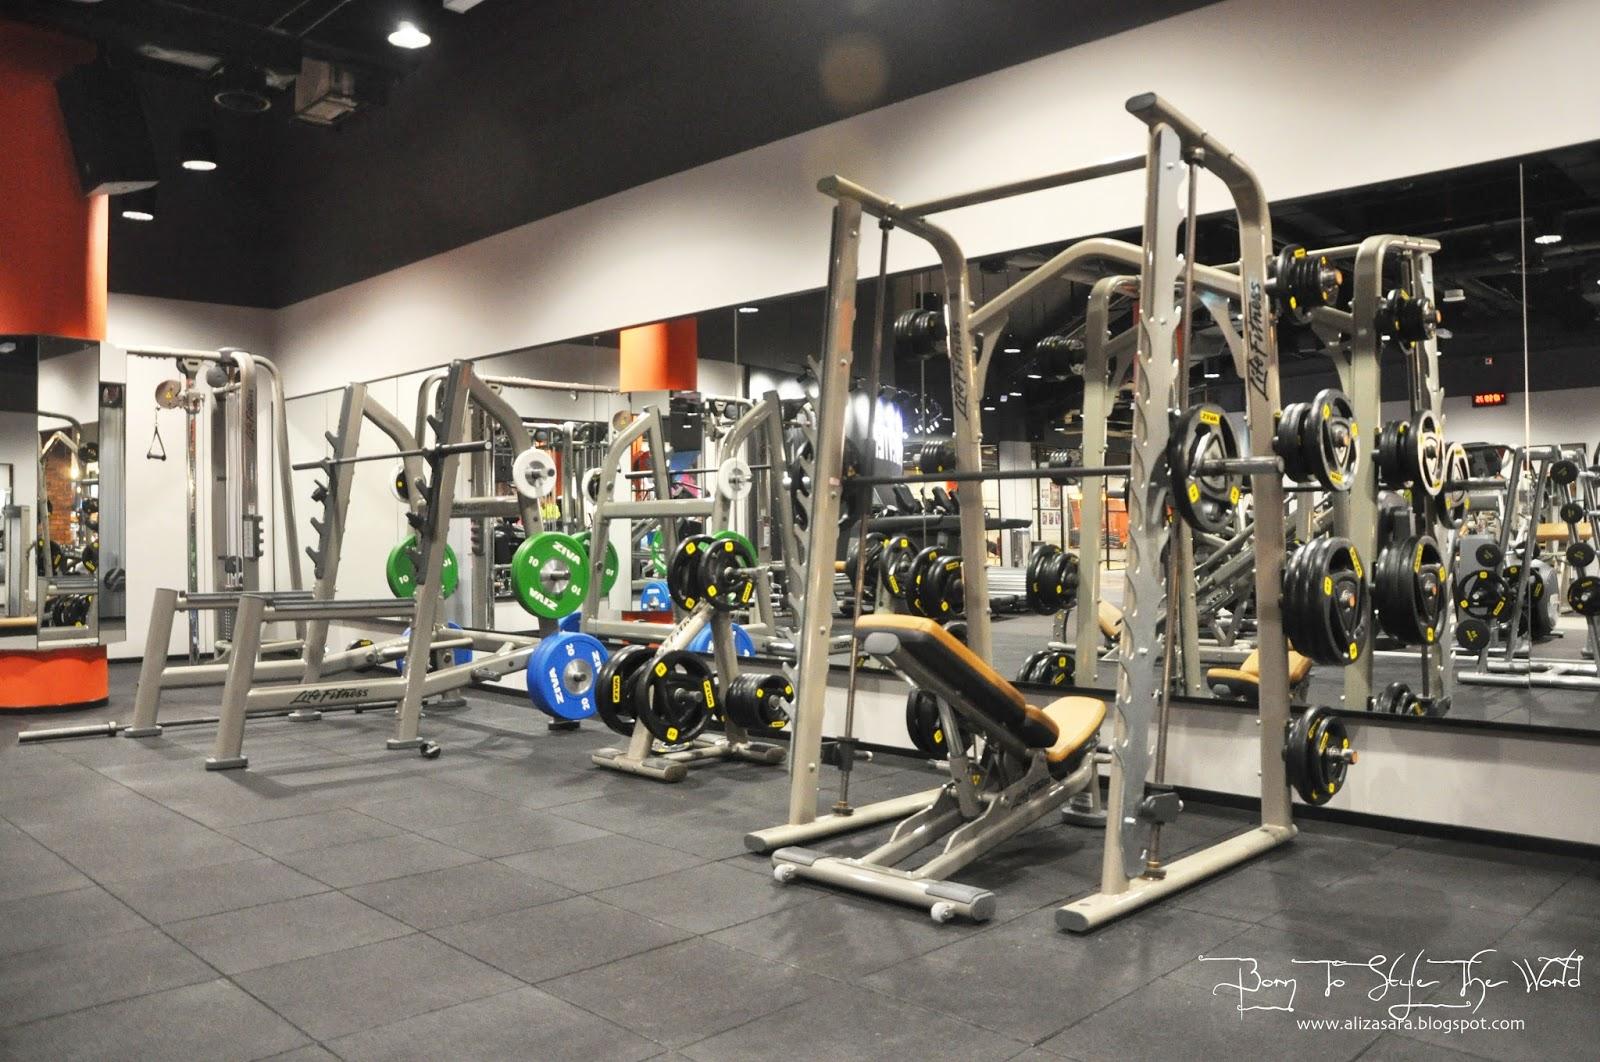 WTB - Celebrity Fitness Membership - gymkaki.com